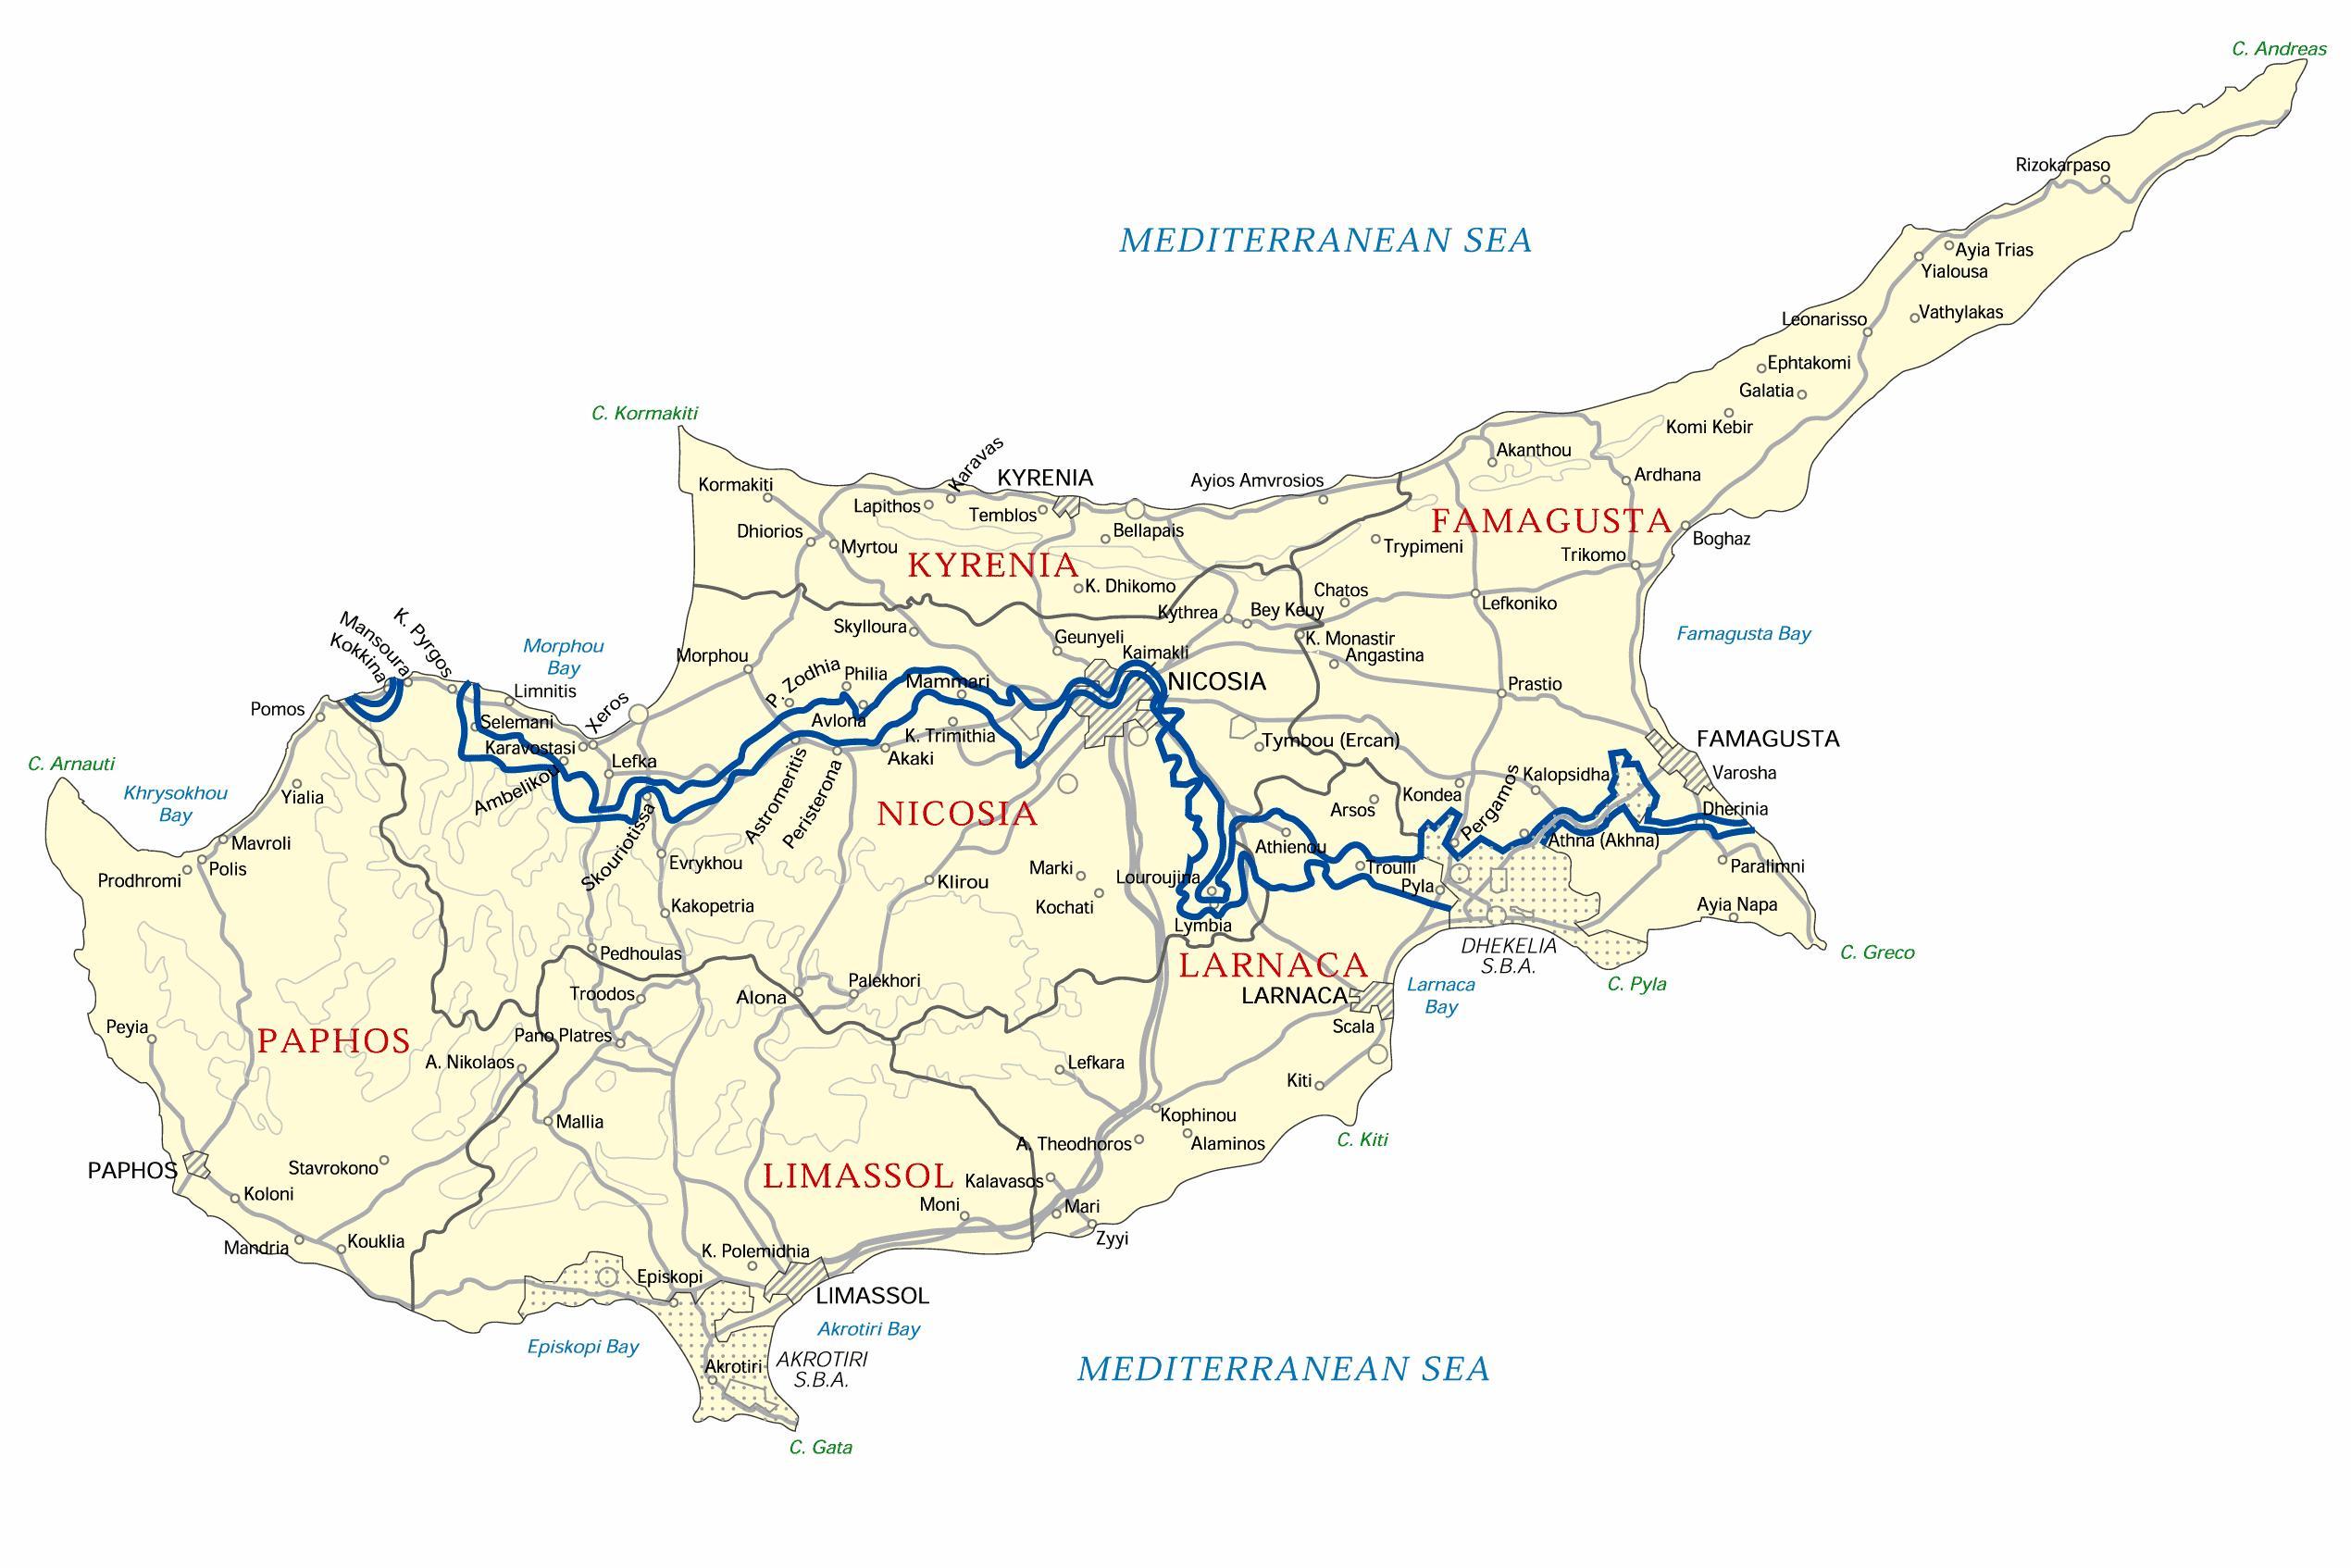 Cypern Offline Kort Kort Over Cypern Offline Det Sydlige Europa